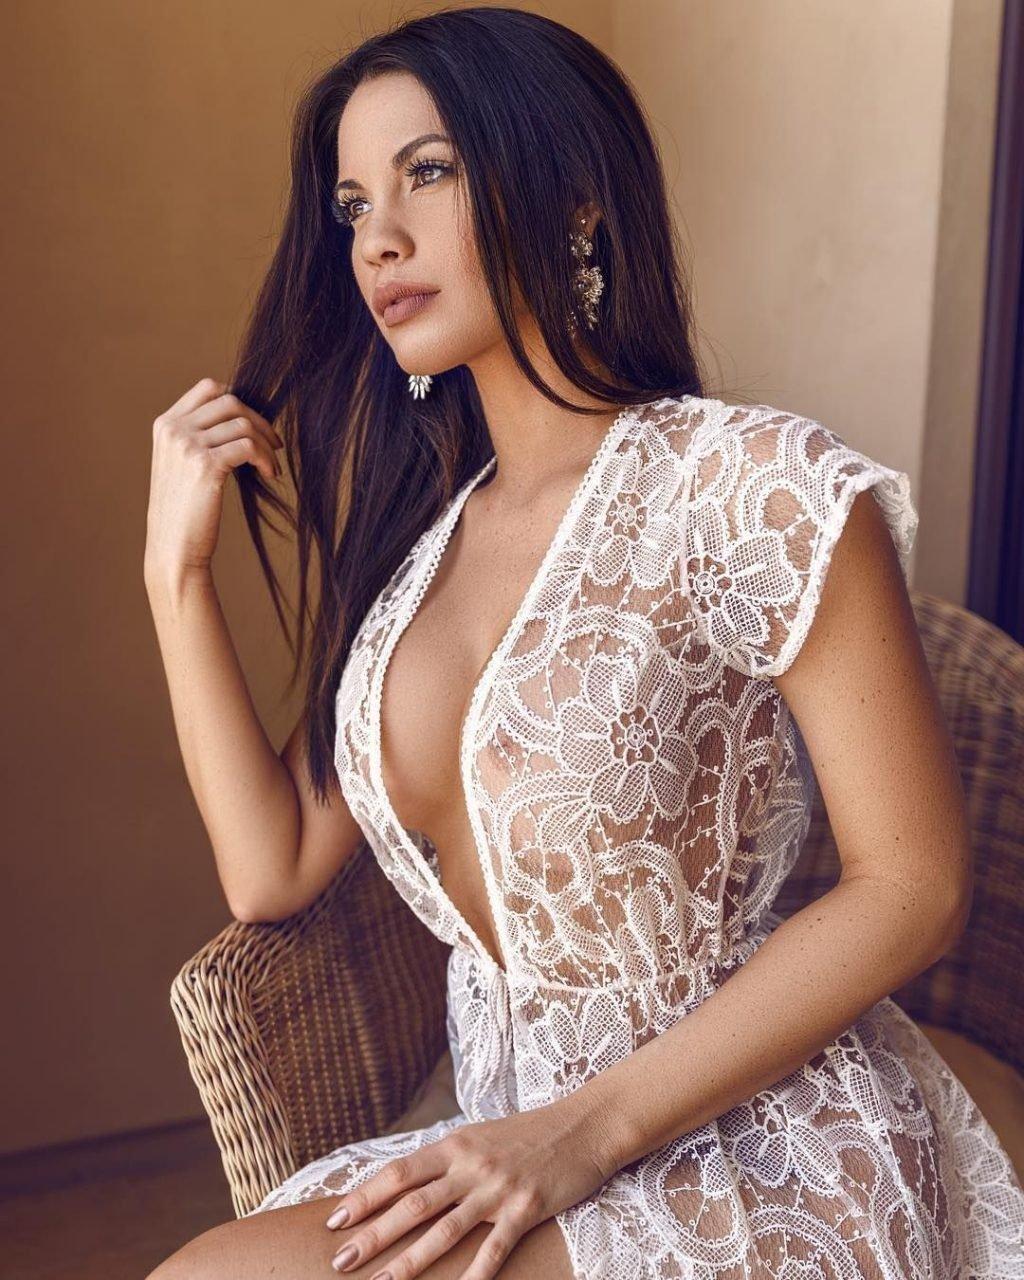 Alexis knapp nude,Abbie holborn ass Porn pictures Amelia windsor sexy,Jessica alba cleavage 7 Photos